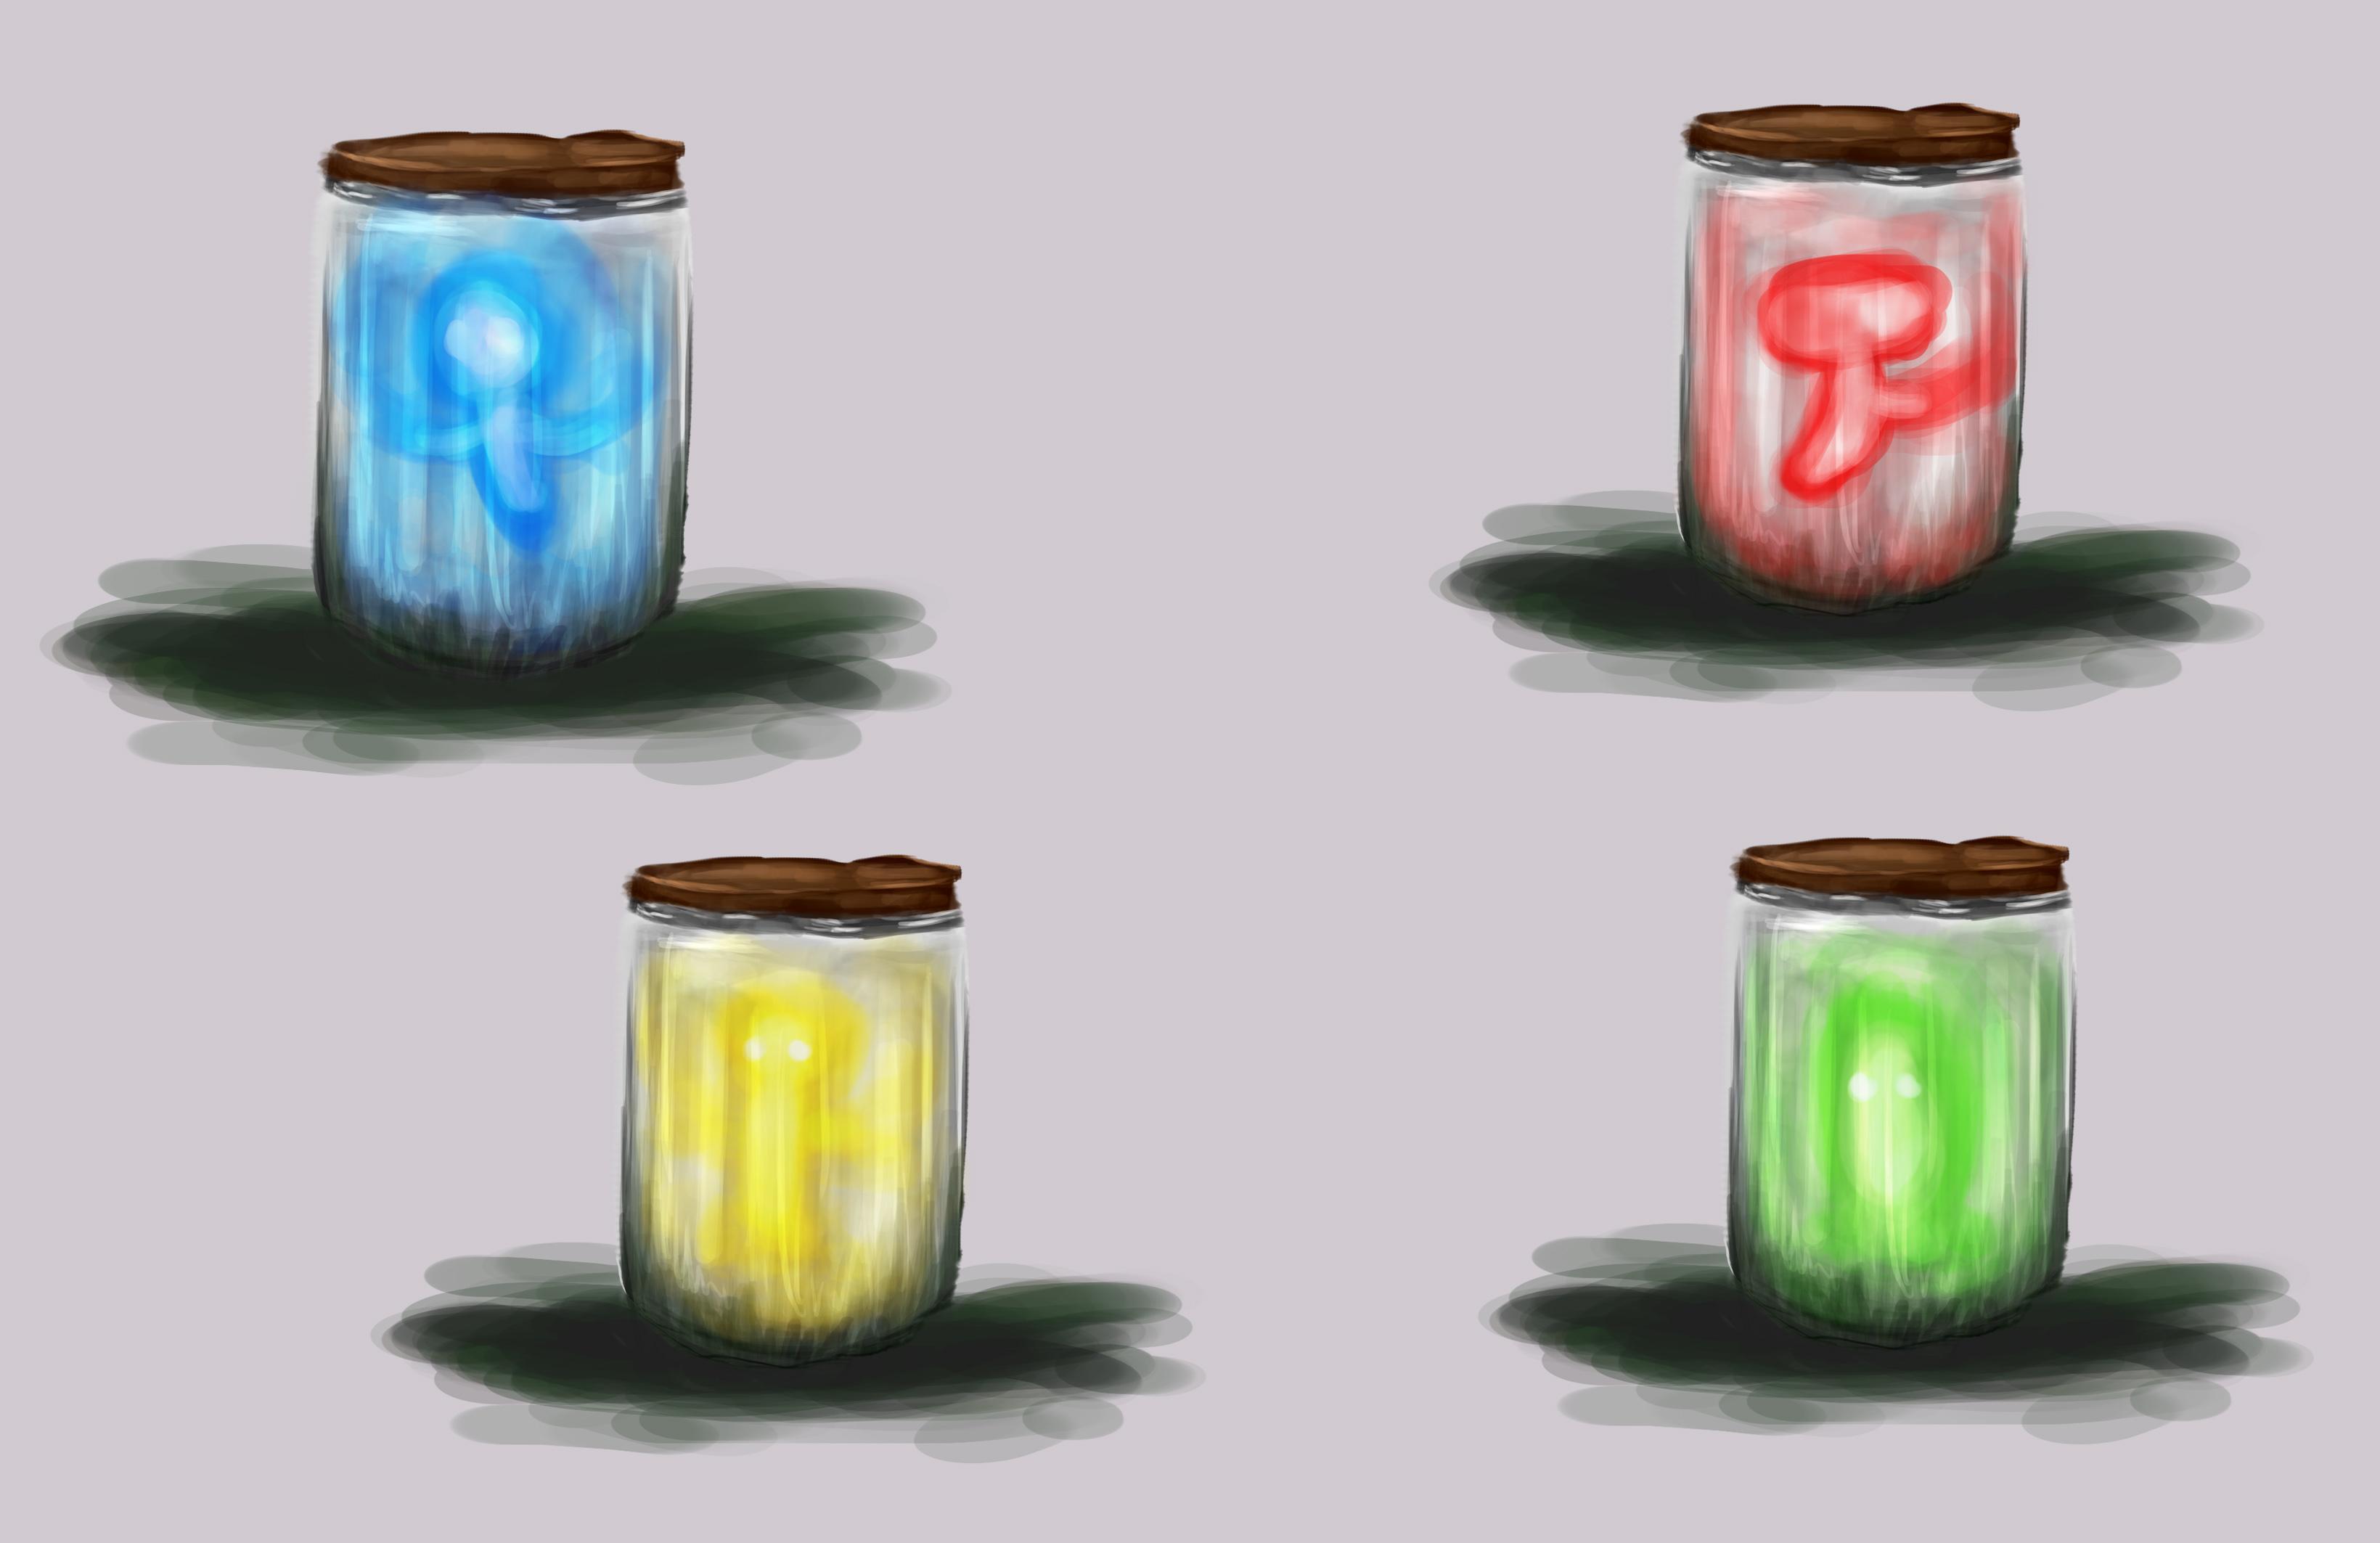 Concept art wisps characters 5